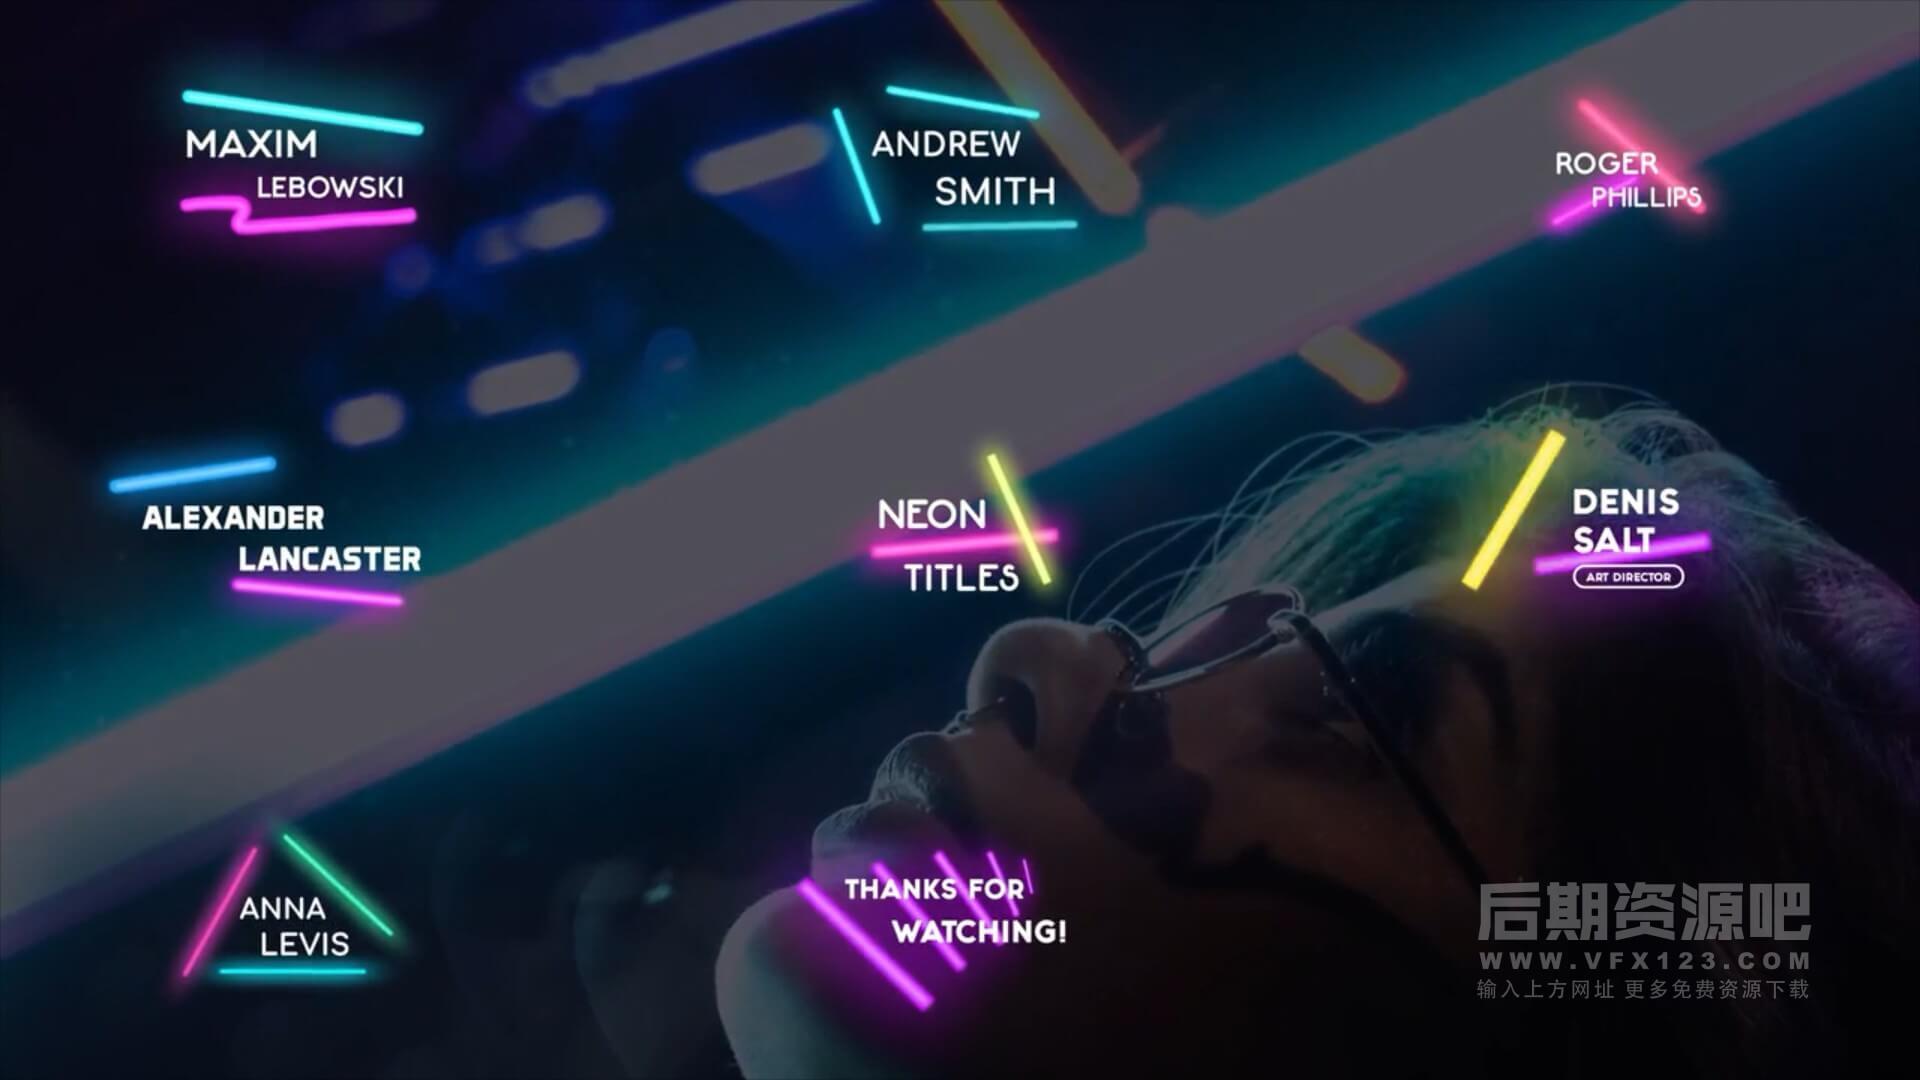 fcpx标题插件 8组时尚霓虹灯闪光效果标题模板 Neon Lights Titles